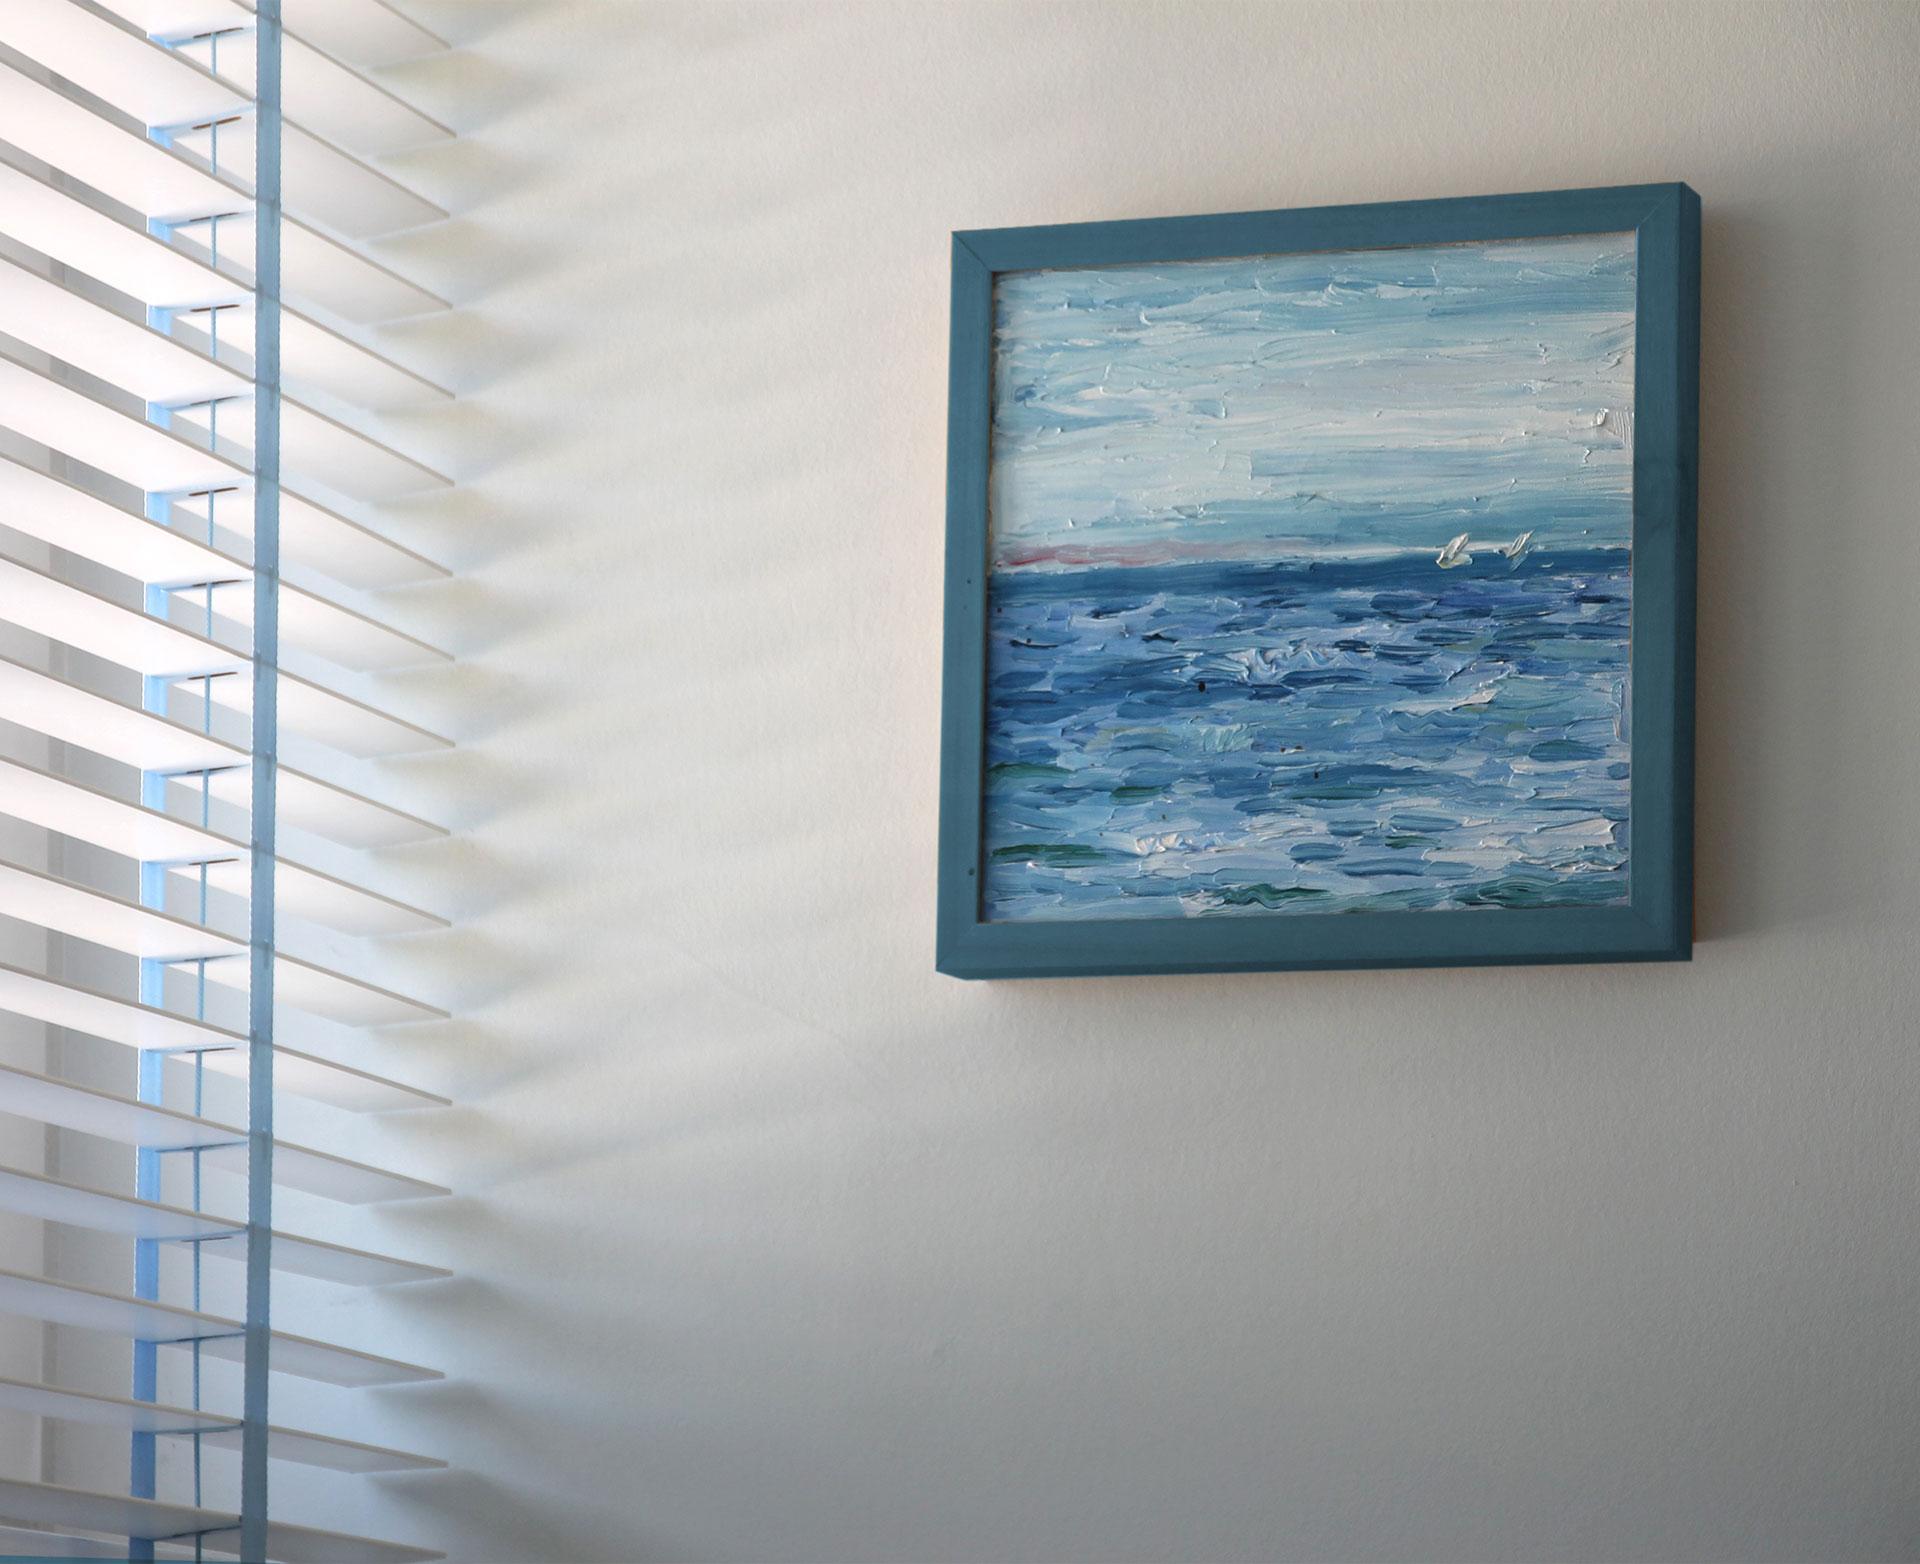 FENG SHUI - Energie im fluss | beratung - hamburg - schlafzimmer - kueche - arbeitszimmer - eingang - garten - brunnen - farben - elemente - einrichten - ruhe - gelassenheit - feng shui ausbildung | Fenster - Bad